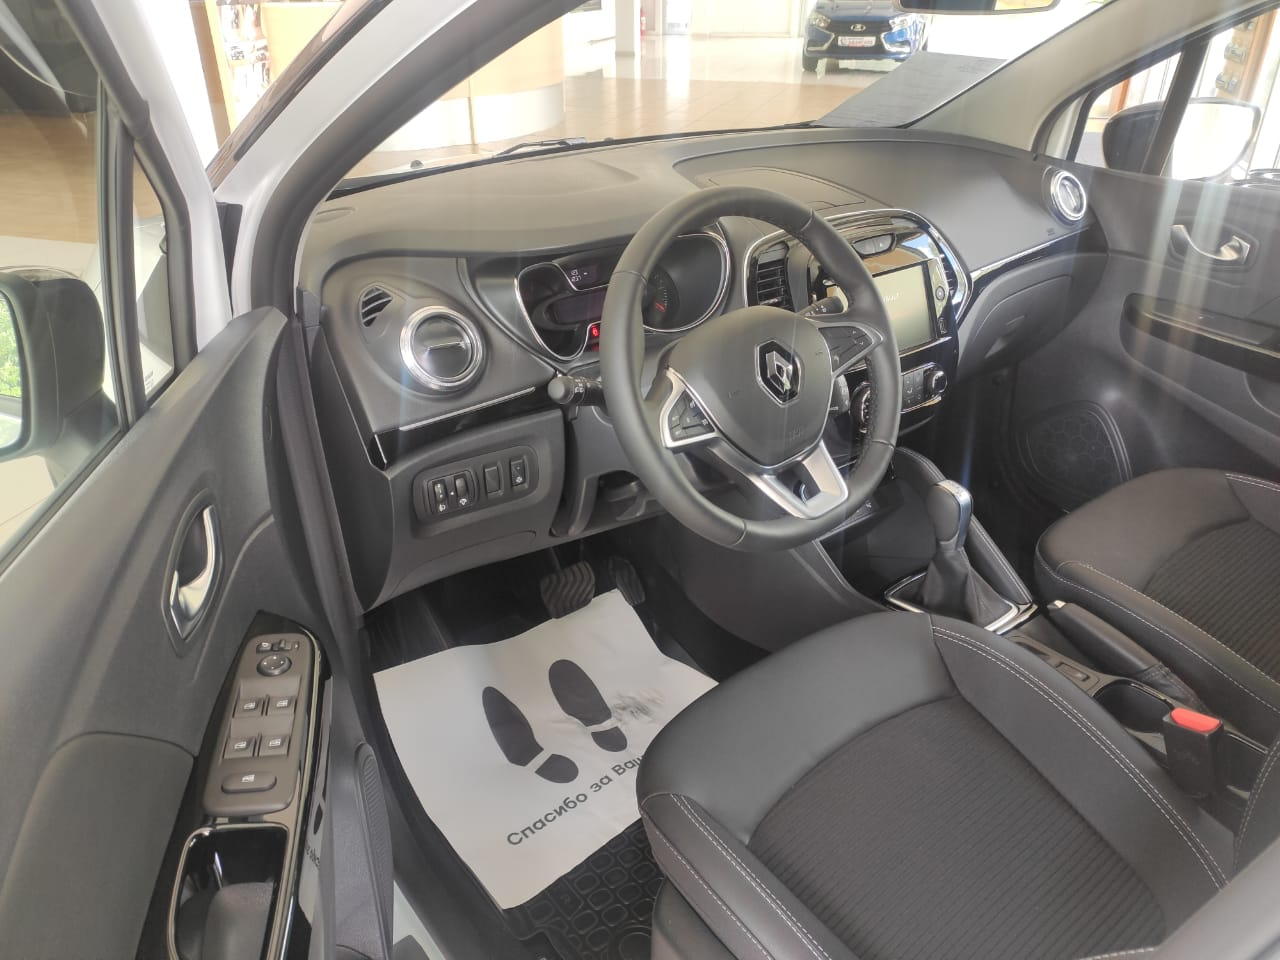 Renault KAPTUR 1.6 л., 16-кл., (114л.с.) CVT X-Tronic, 4х2. Style. Белый с черной крышей. 2021